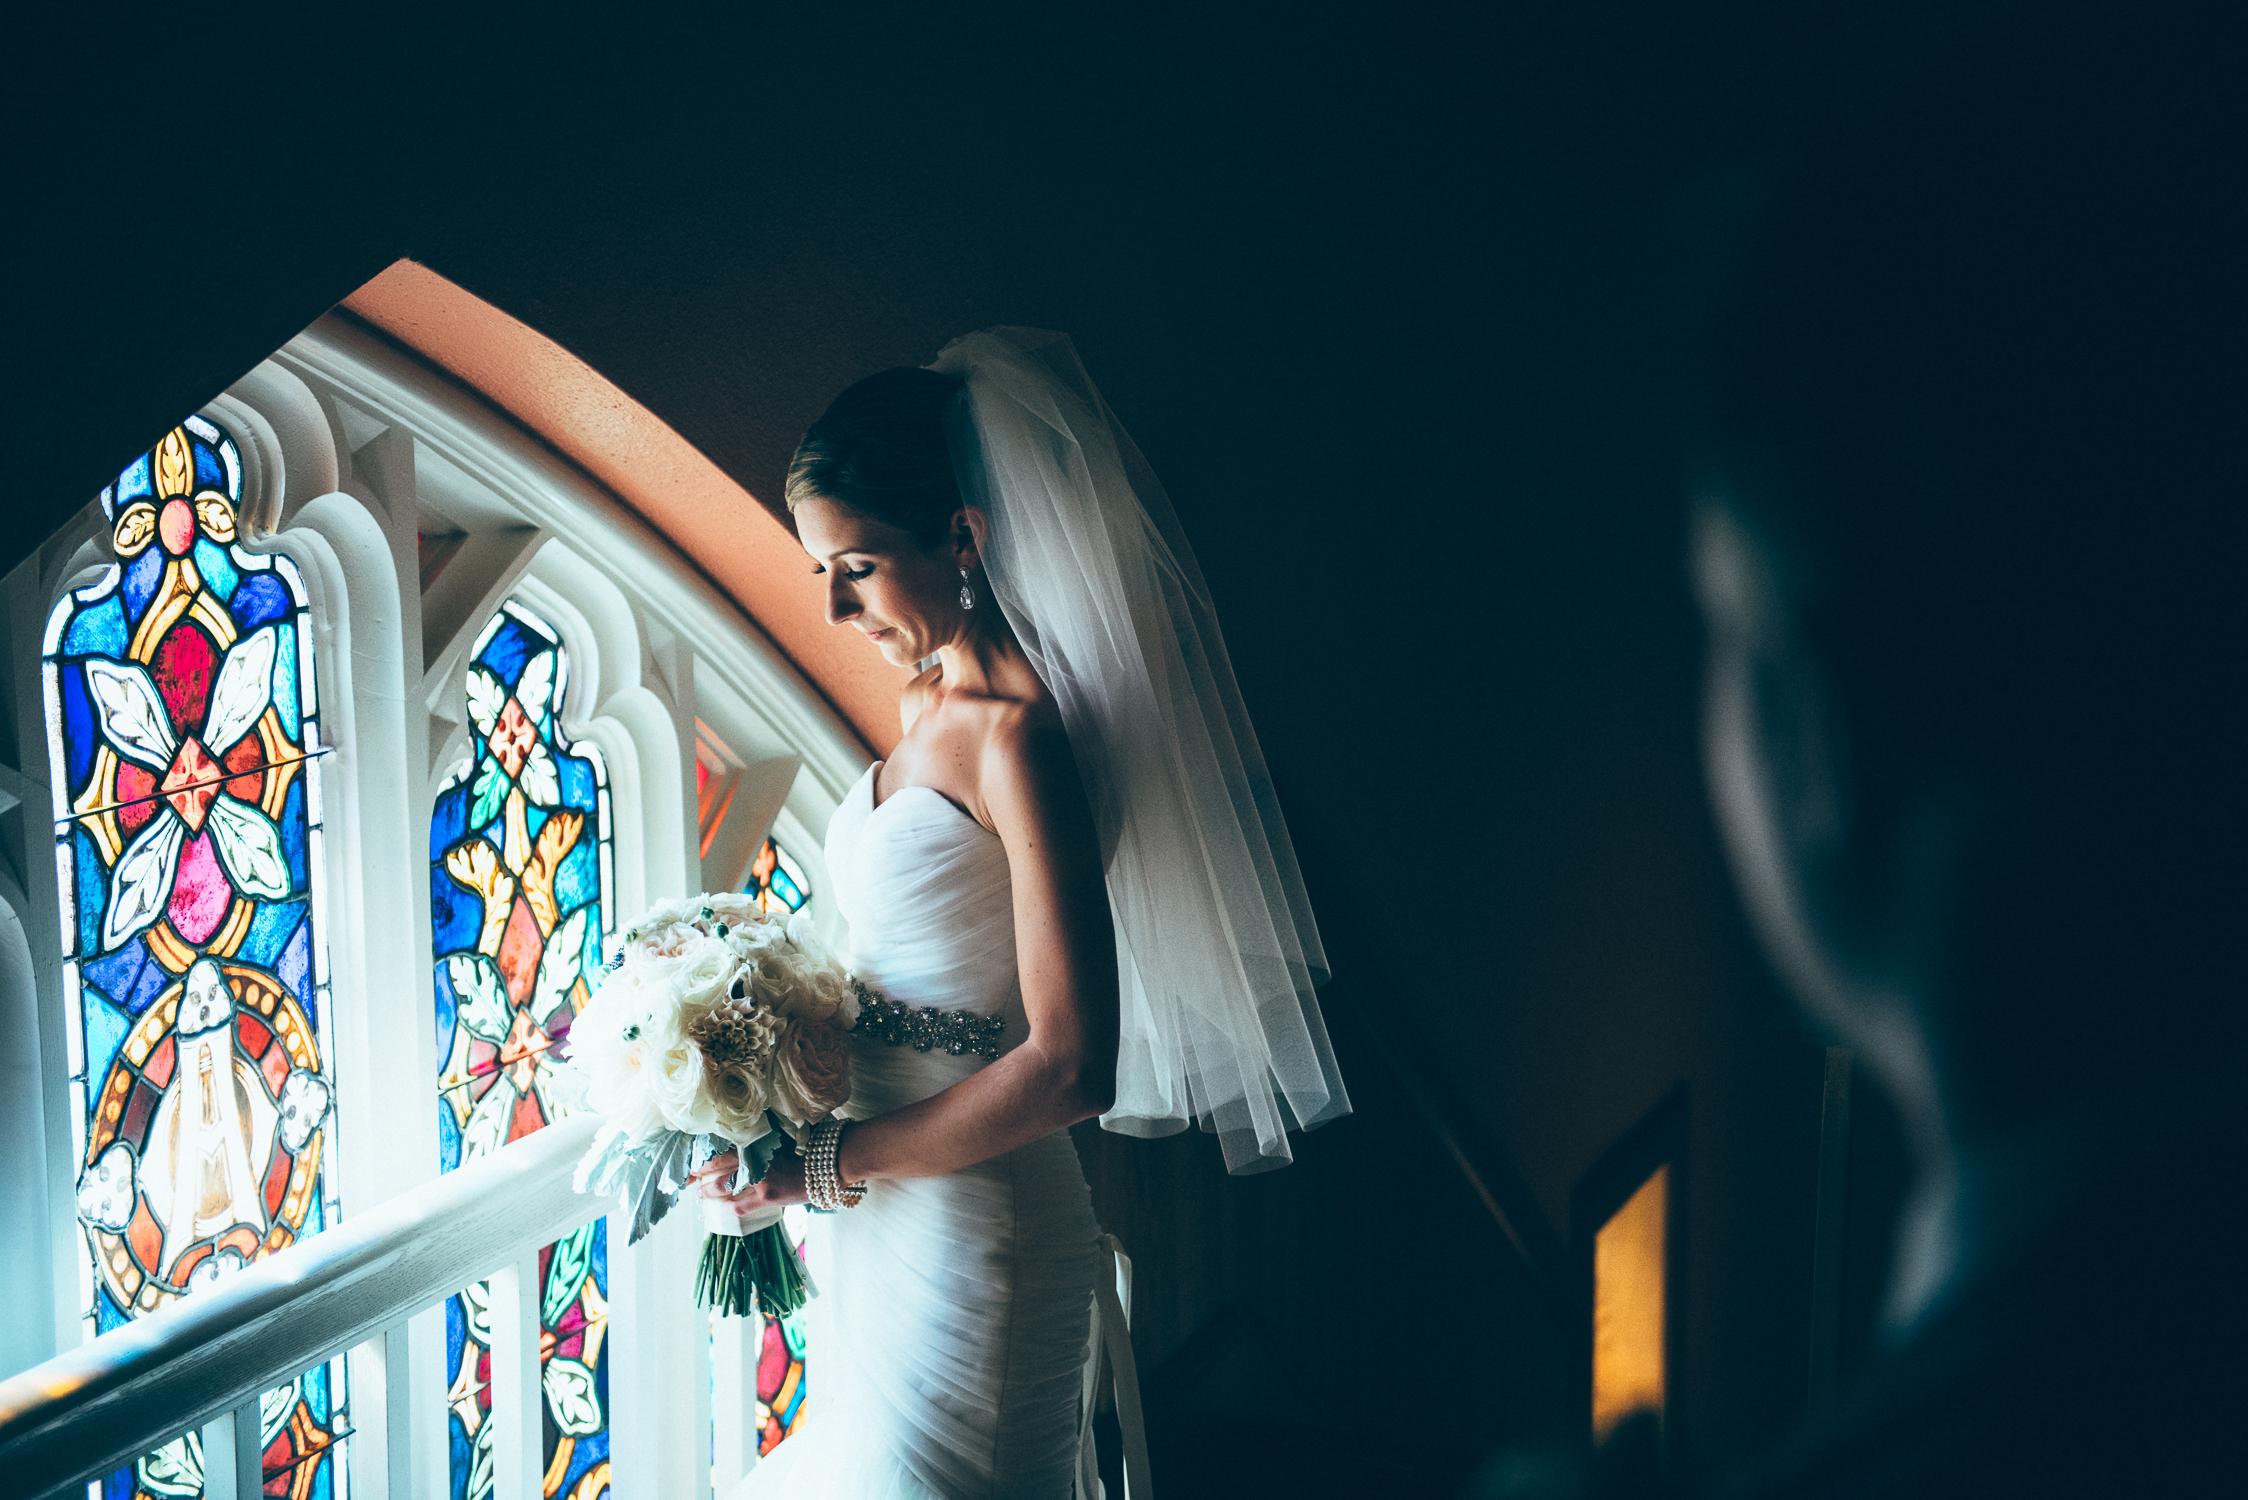 boston-wedding-photography-mccarthy-51.jpg